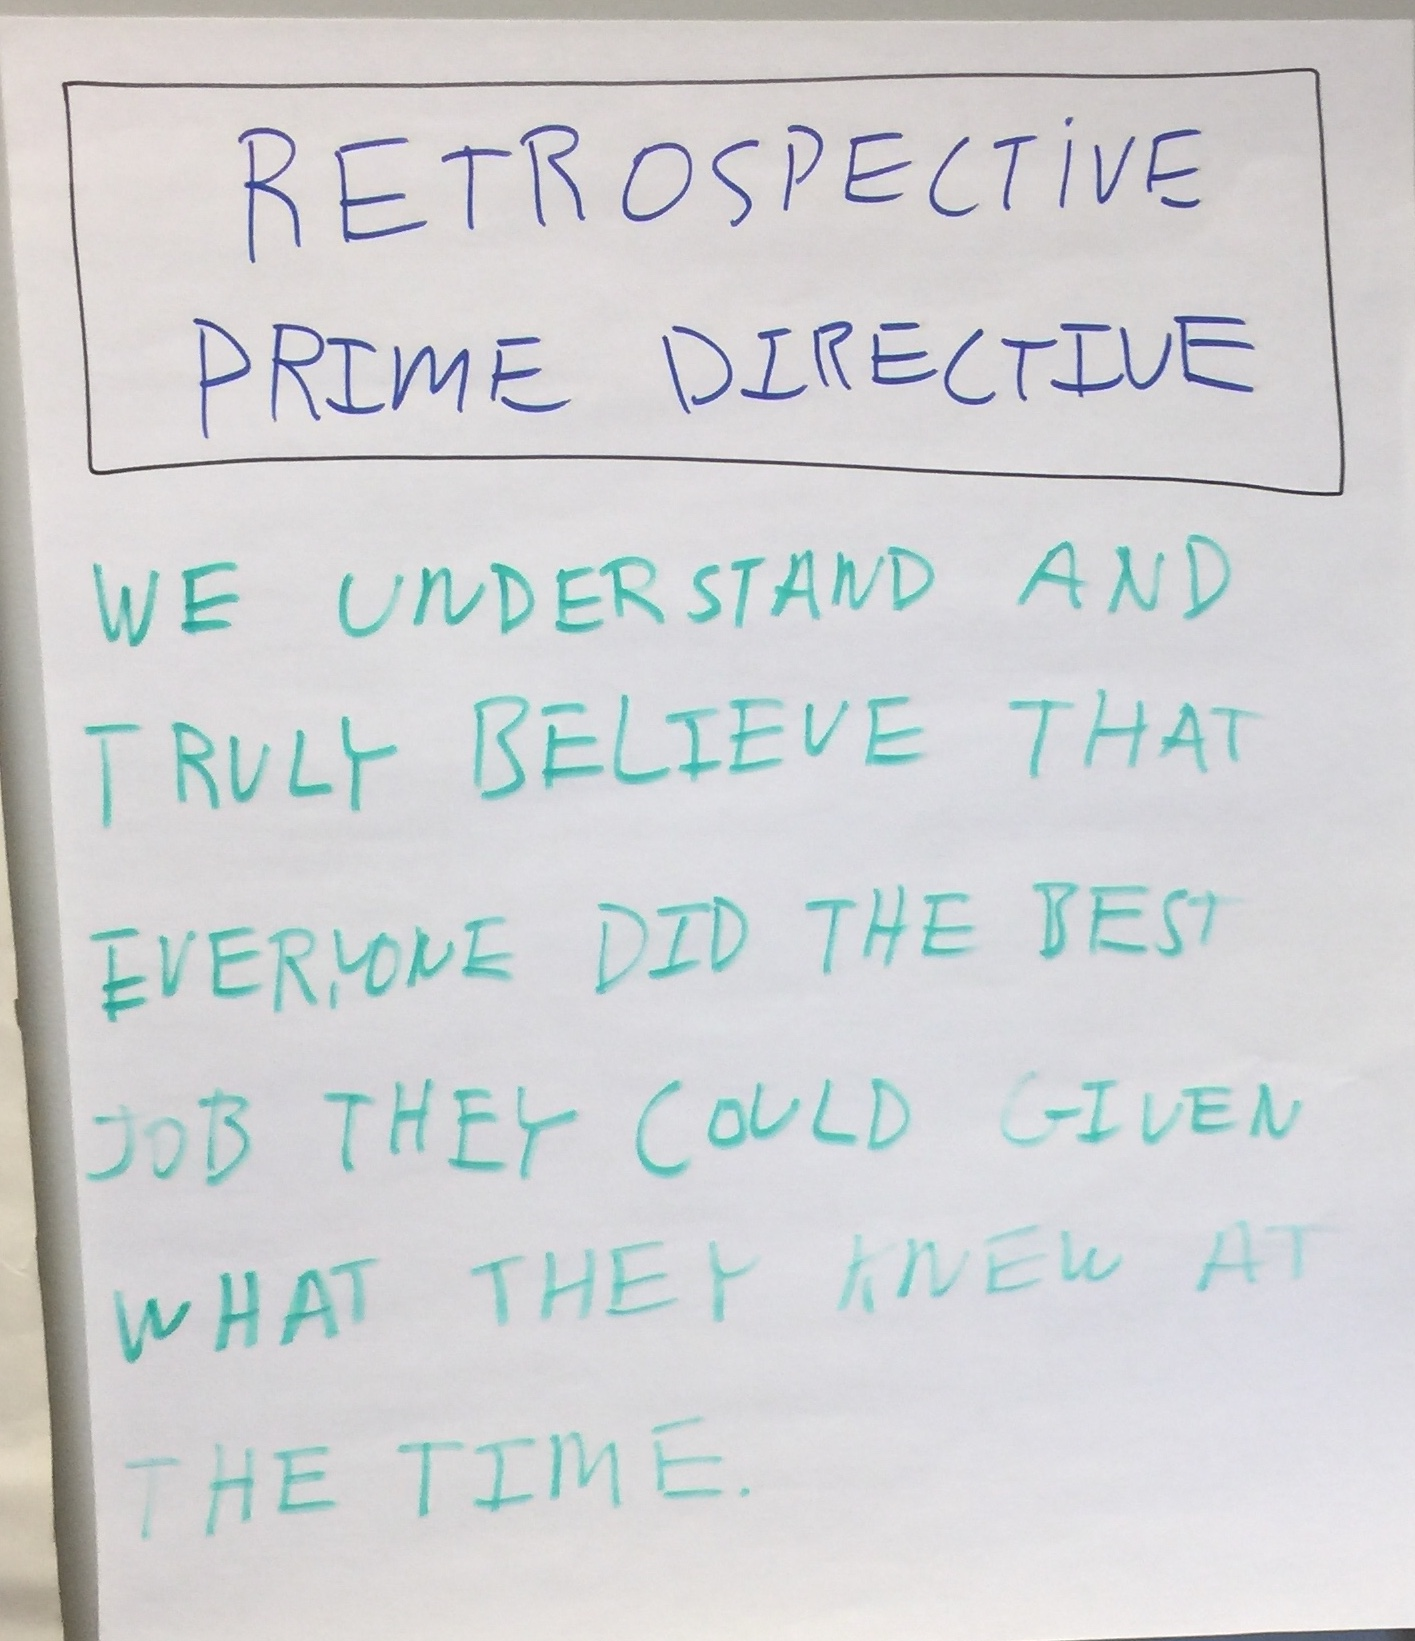 Timeline Retrospective - Prime directive